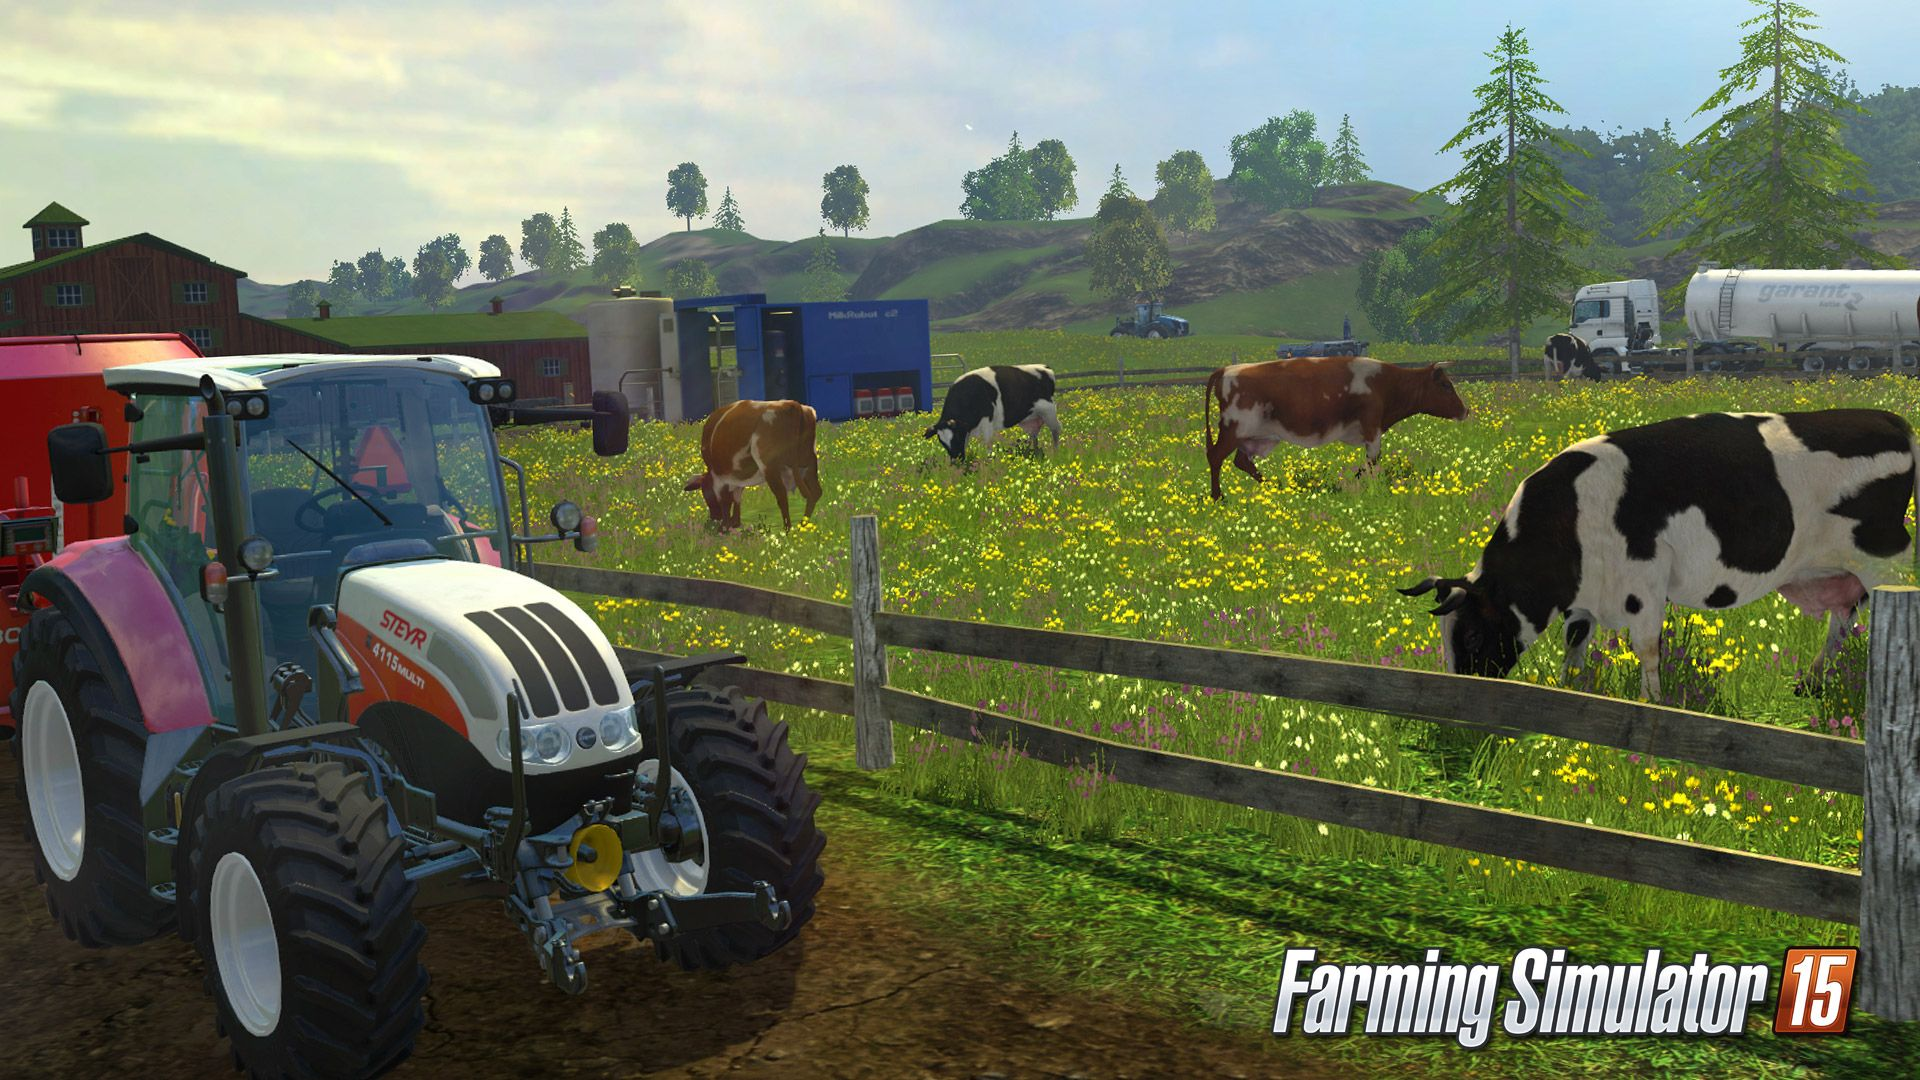 Nice farming simulator 15 windows select http gameclone com au games simulation farming simulator 15 windows select pinterest farming simulator